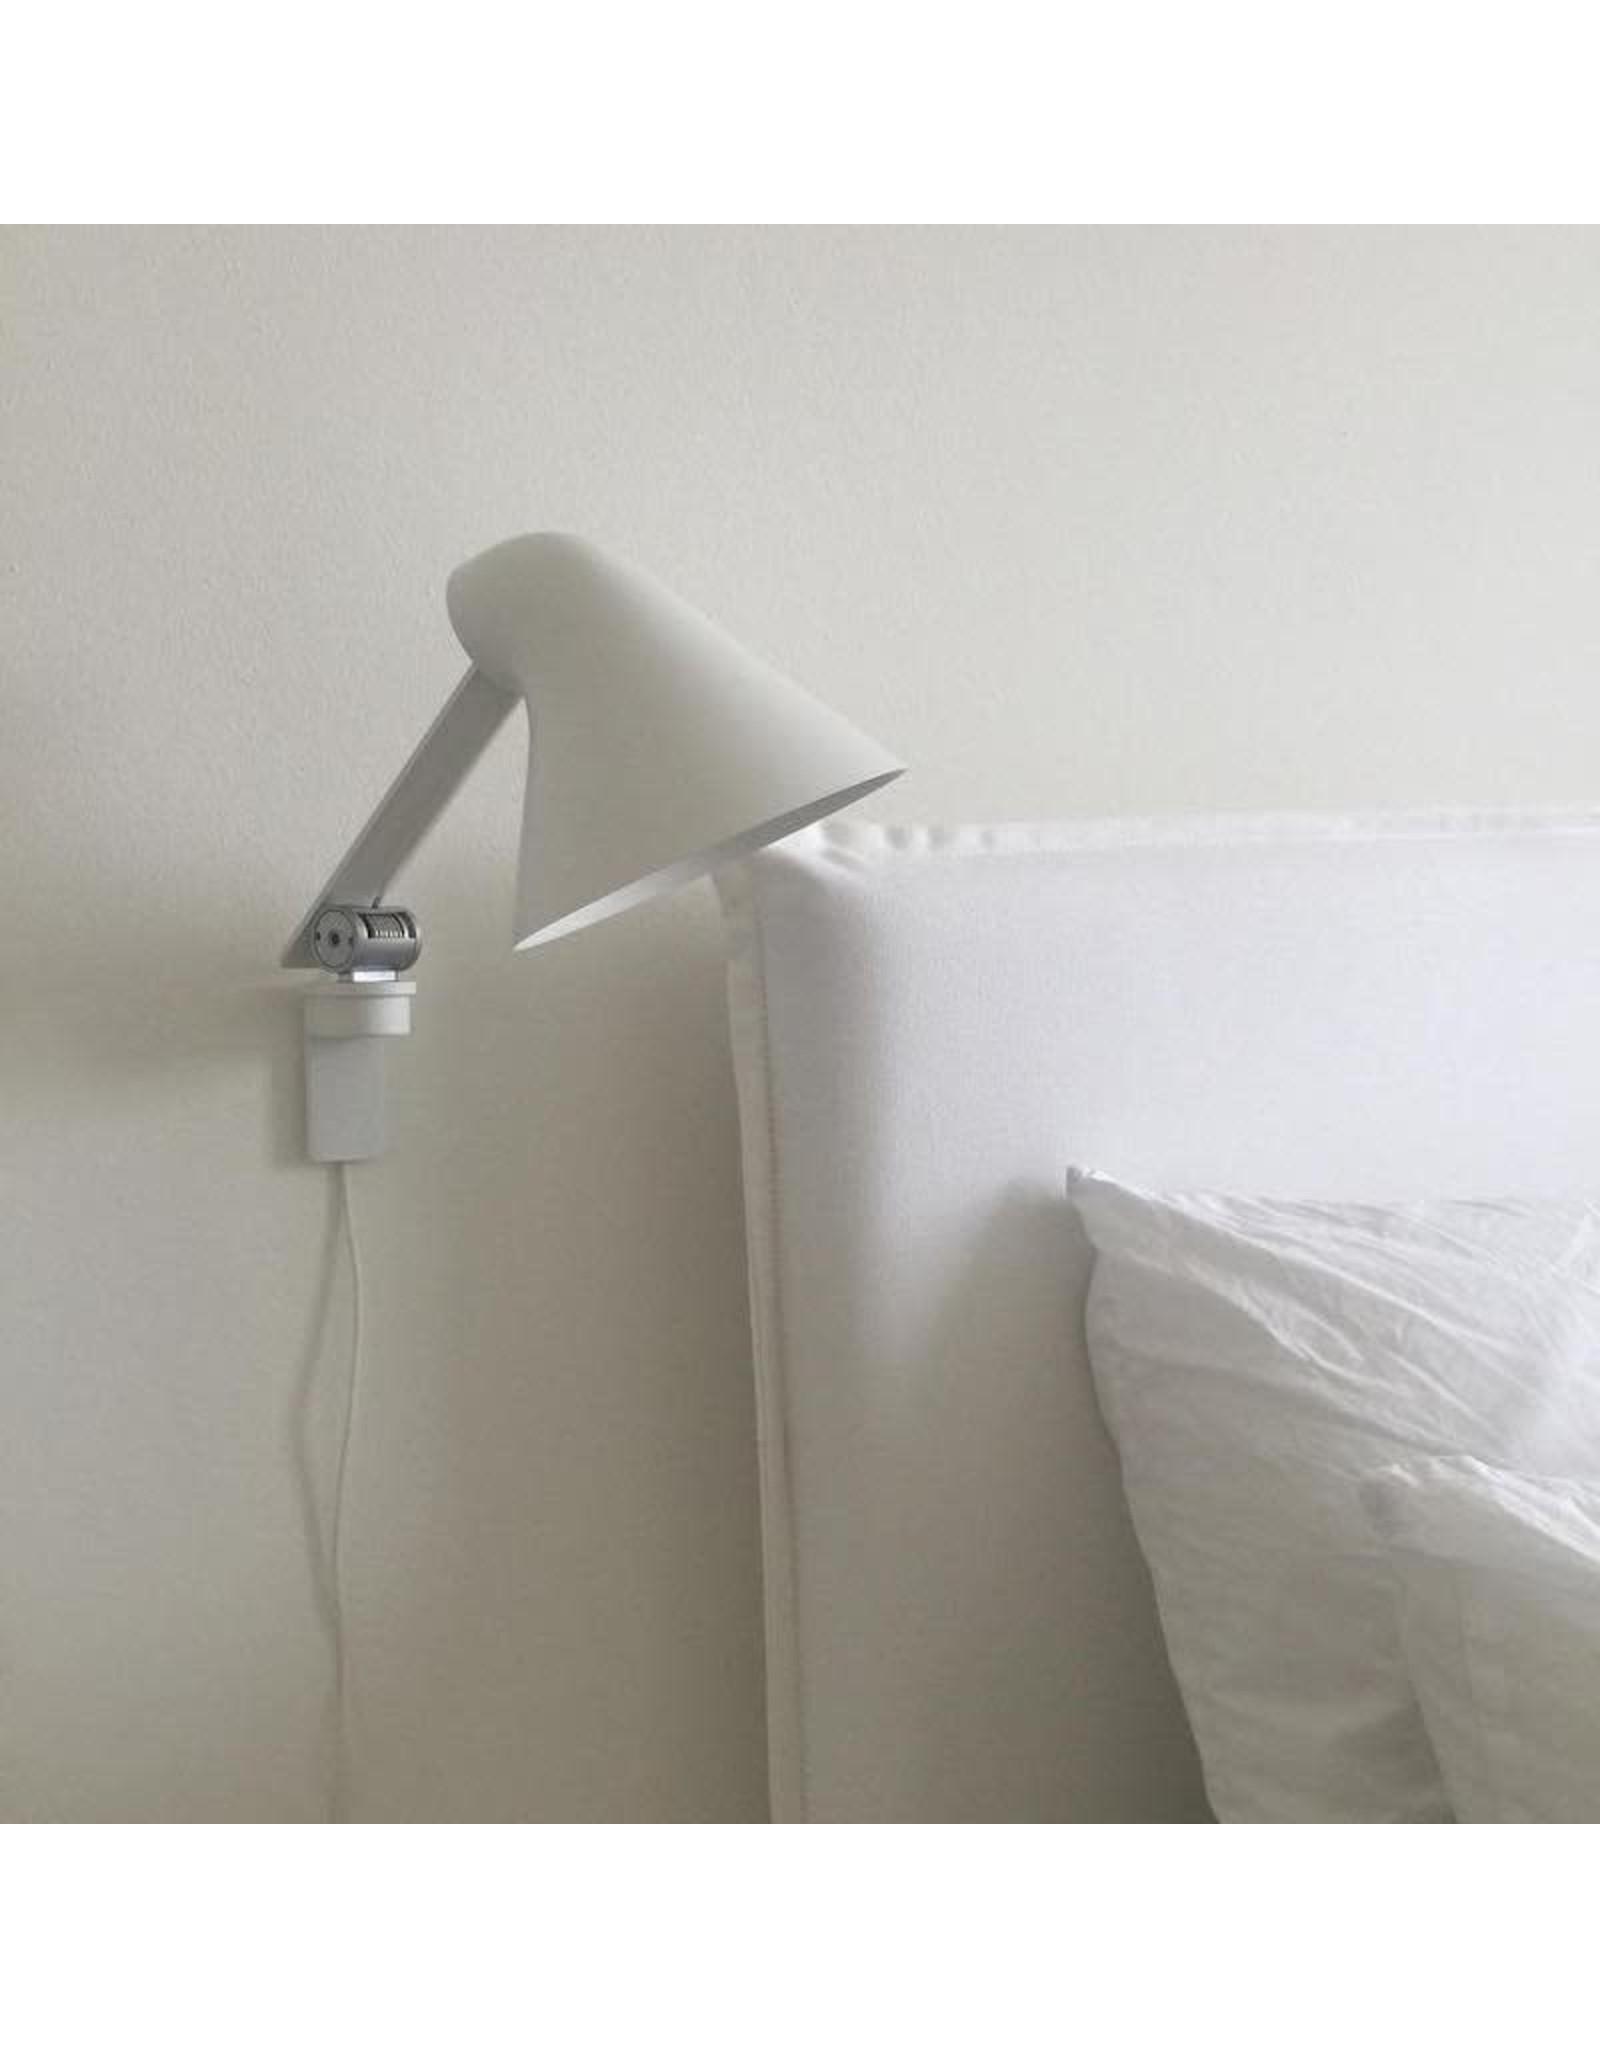 NJP LED WALL LAMP SHORT ARM